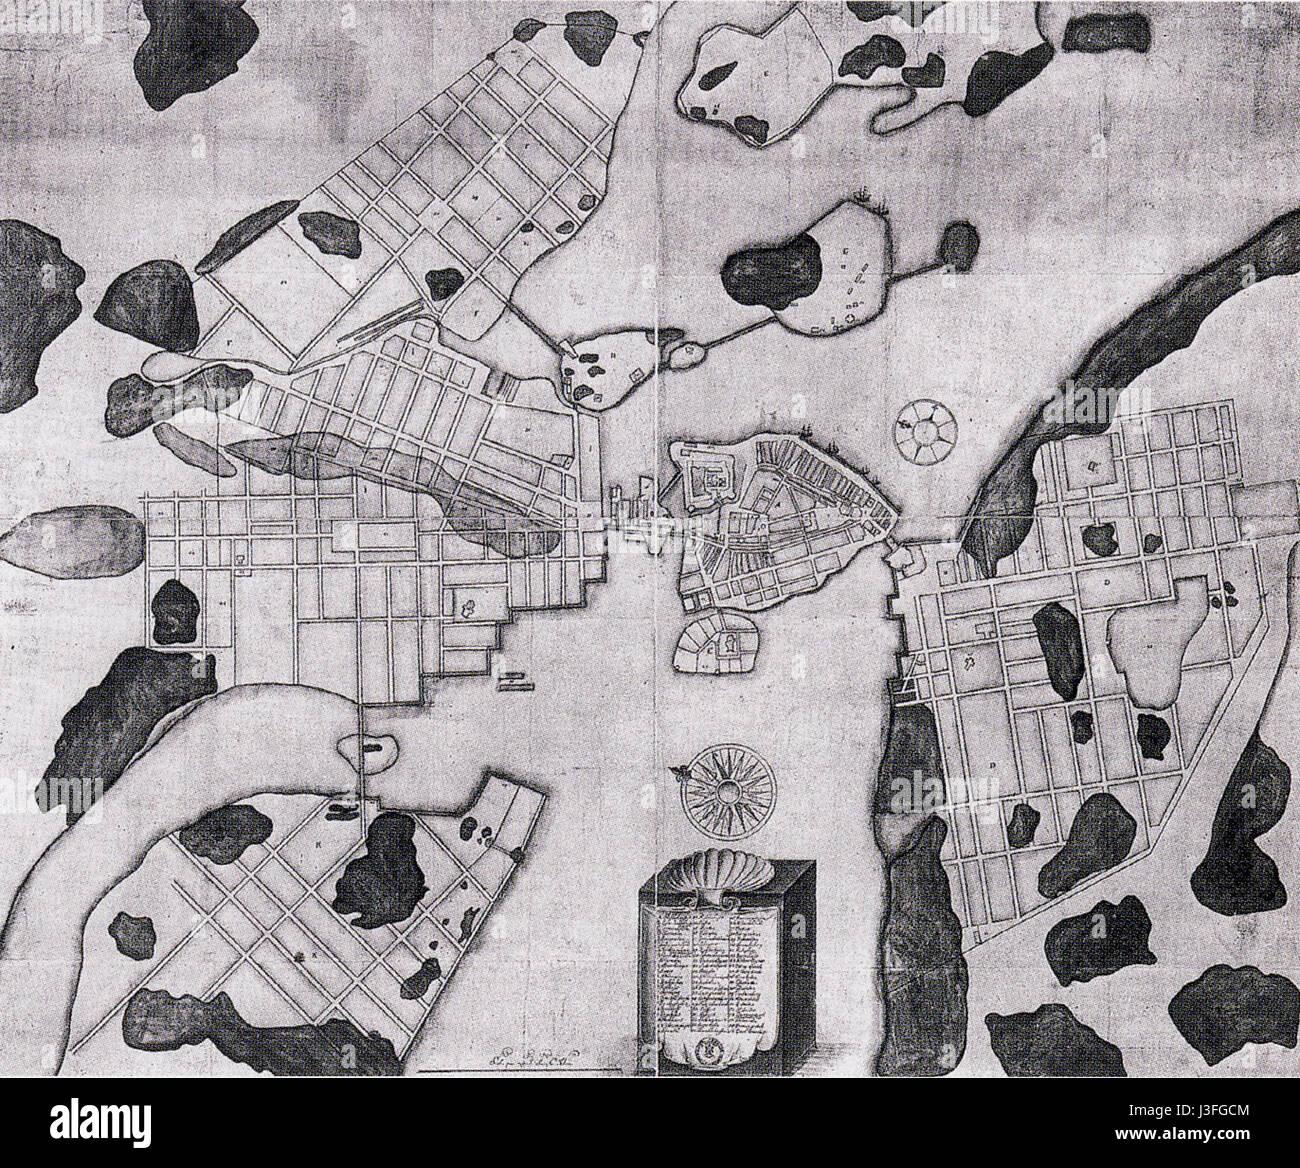 Flemings karta 1600 - Stock Image